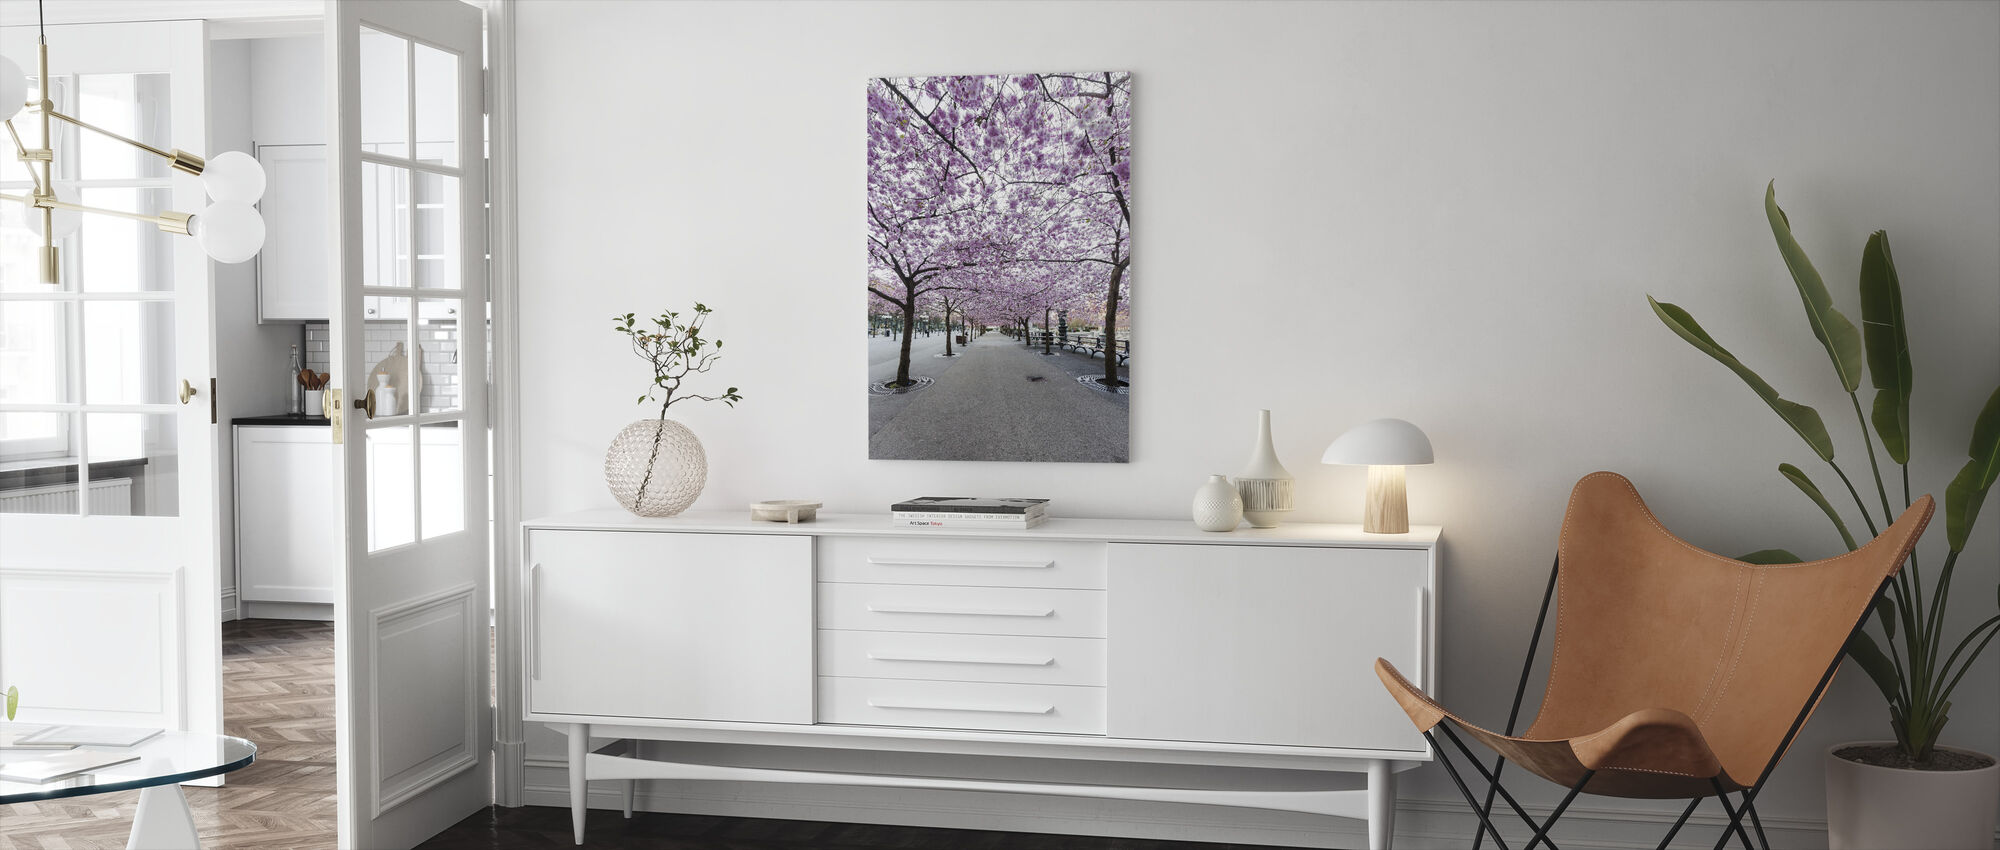 Cherry Tree Blossoms - Canvas print - Living Room